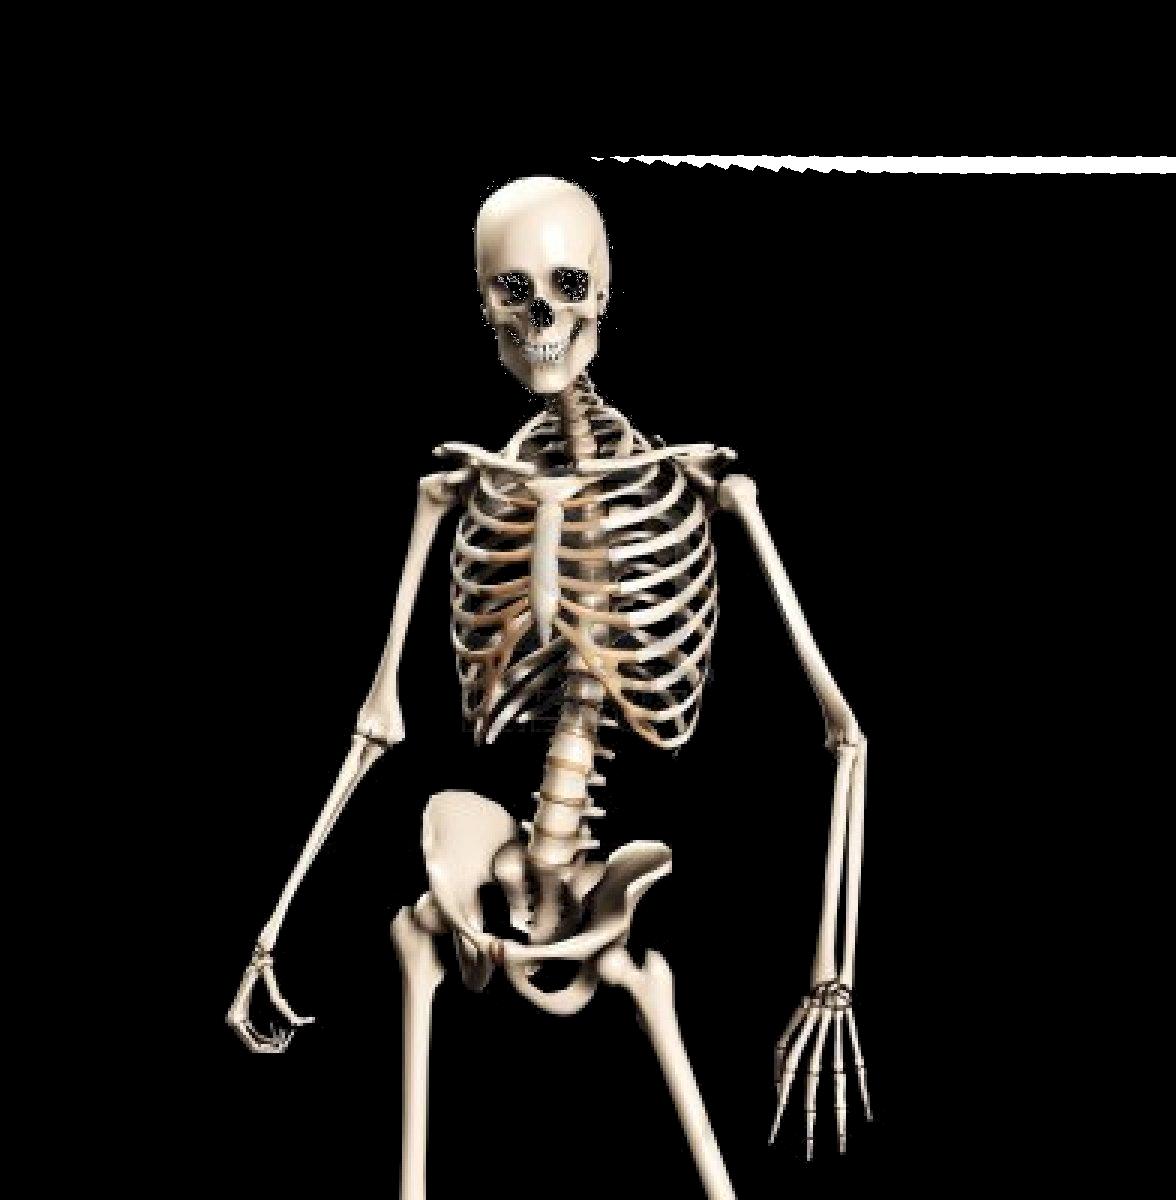 graphic download Skeleton anatomy human png. Bones transparent spooky